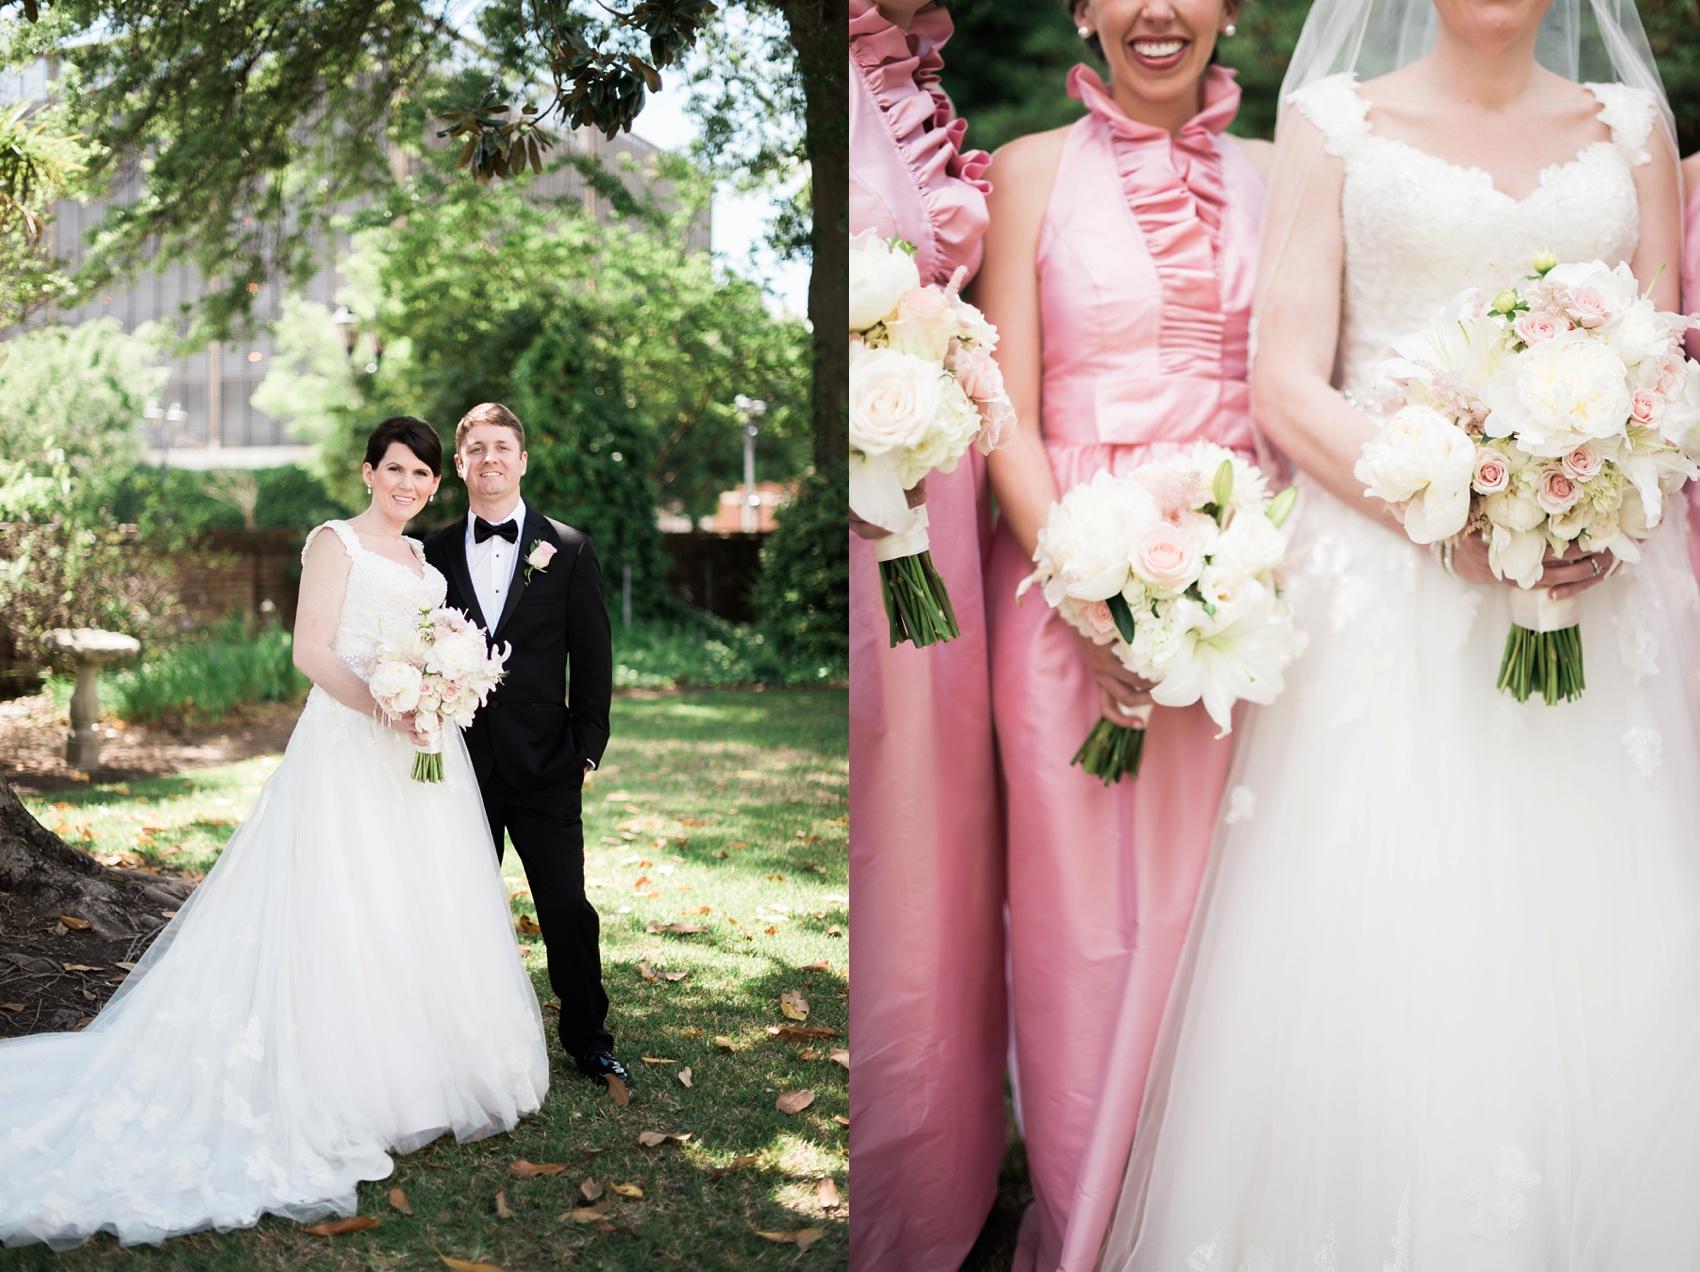 augusta_wedding_photographer_0019.jpg